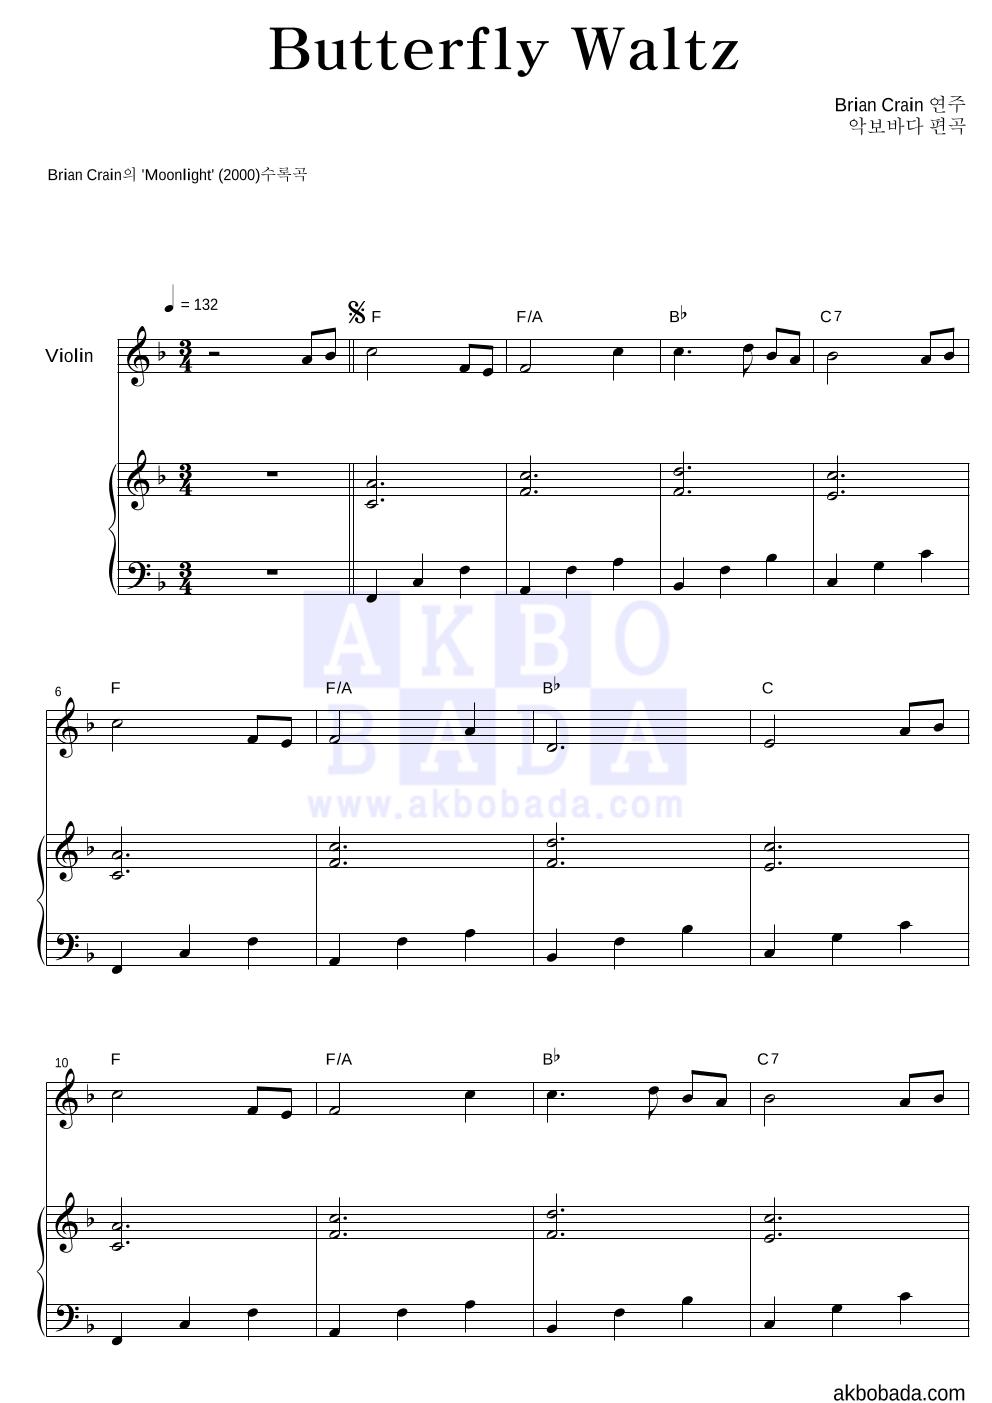 Brian Crain - Butterfly Waltz 바이올린&피아노 악보